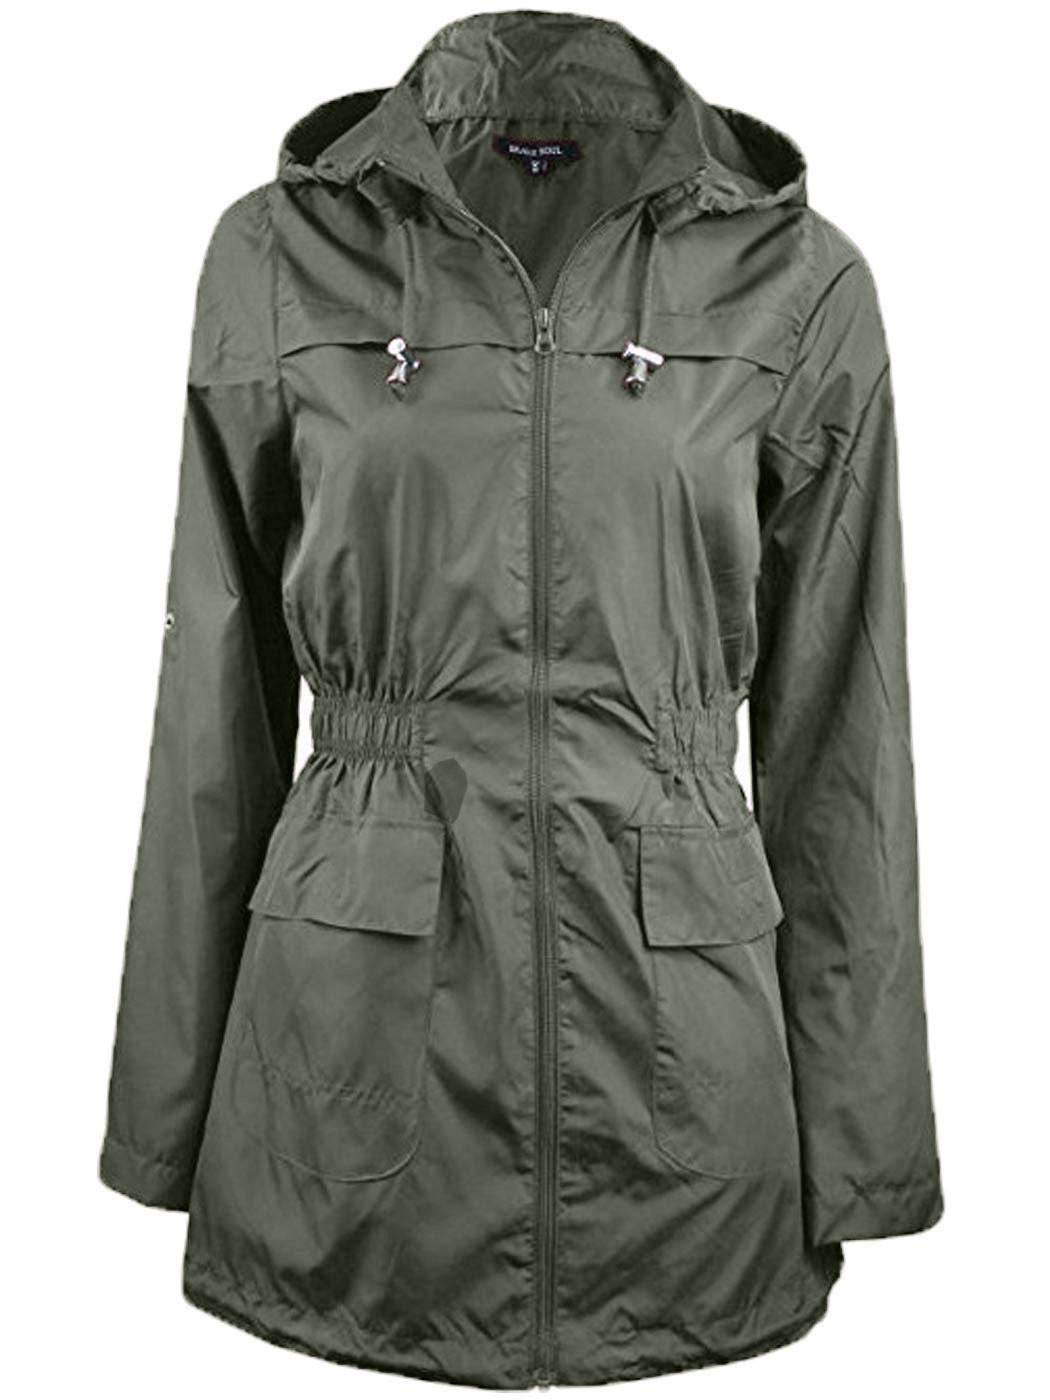 Womens Fishtail PARKA Hooded FESTIVAL Raincoat Jacket Plus Size RAIN COAT L  8 24 - Womens Fishtail PARKA Hooded FESTIVAL Raincoat Jacket Plus Size